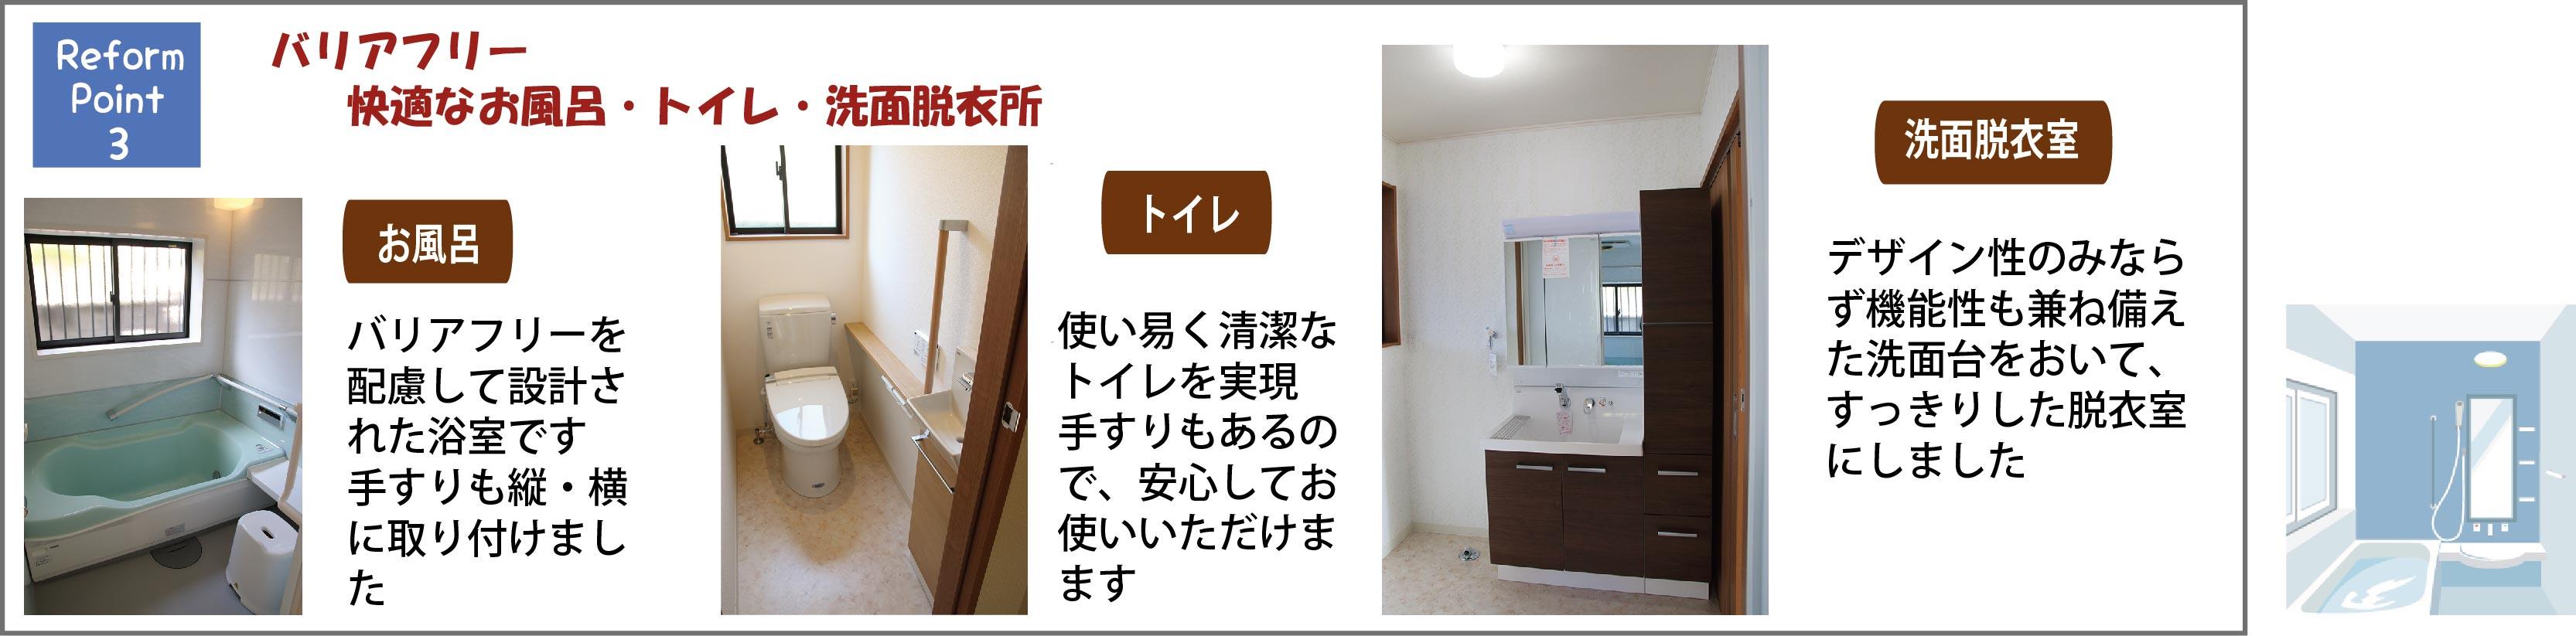 KuraSi-natu-sin93-15.jpg